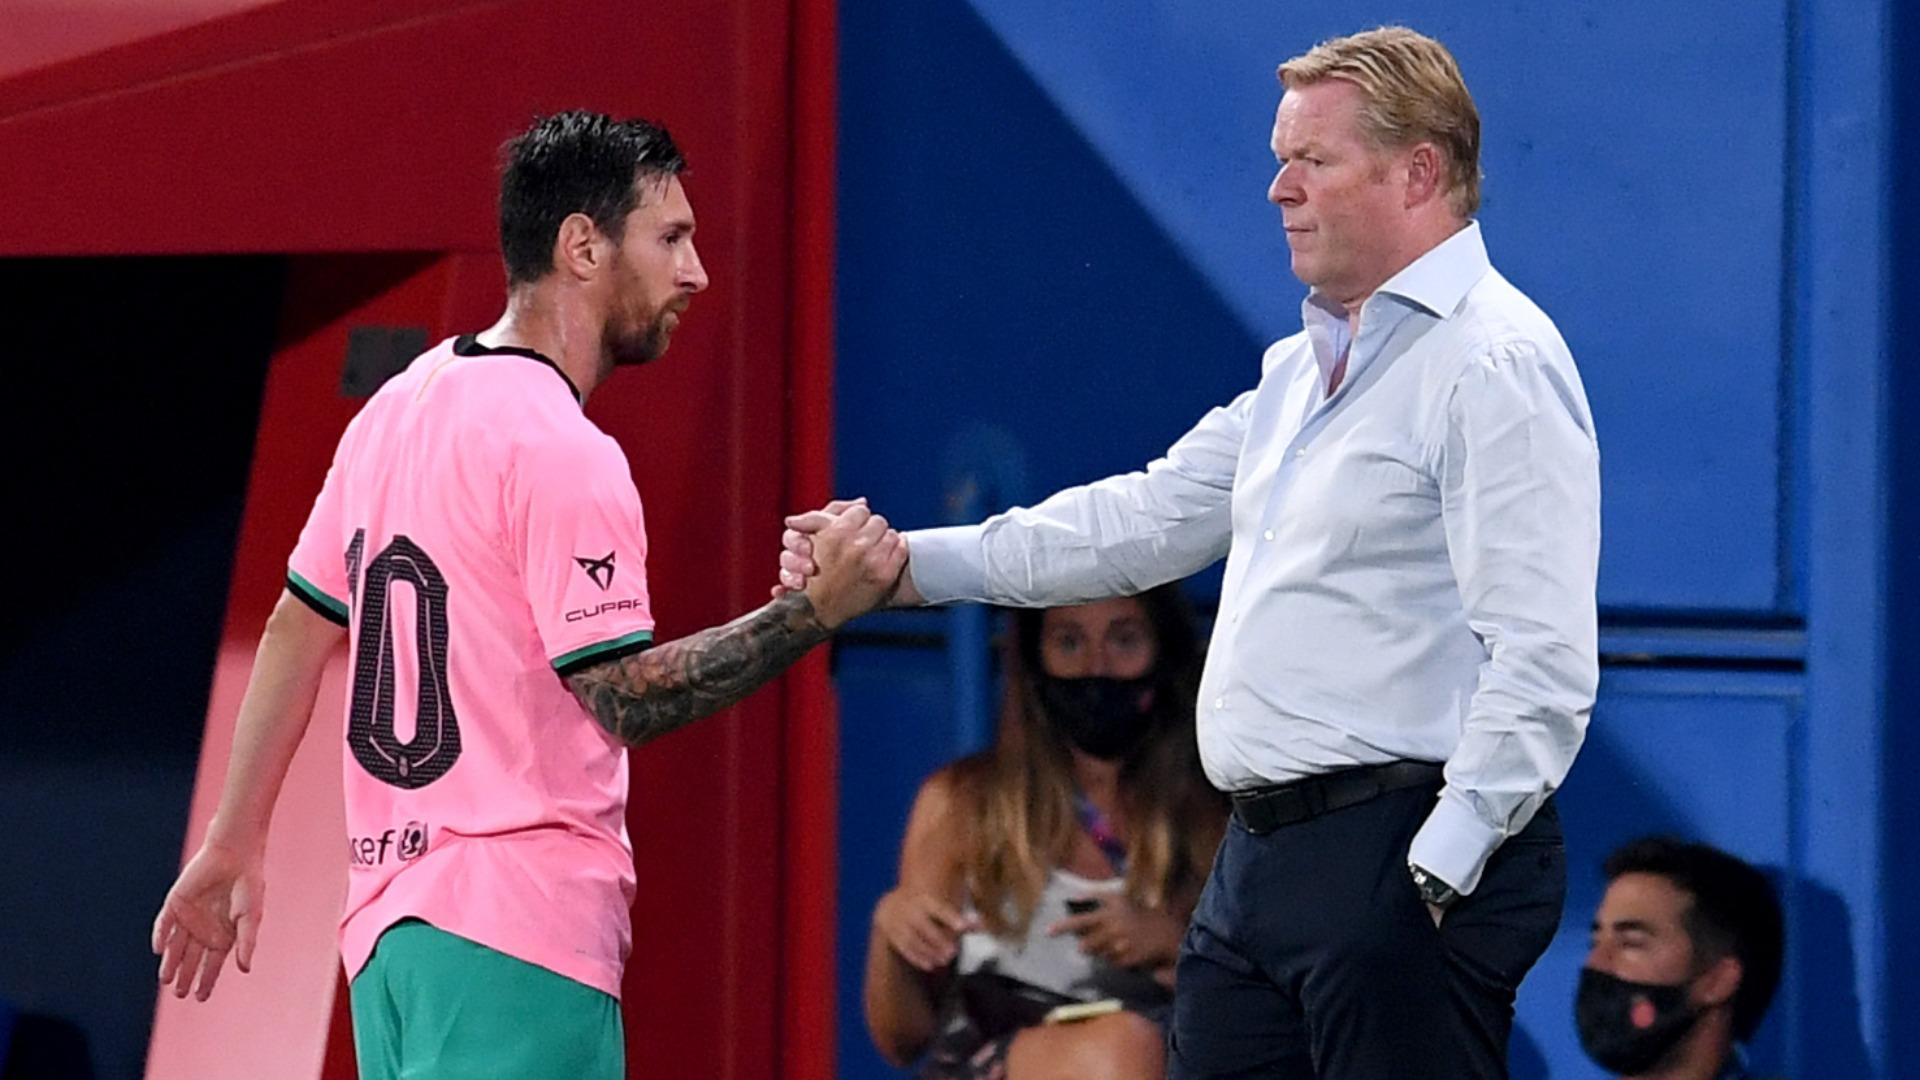 Koeman understands Messi's anger over Suarez exit but insists striker left of own volition